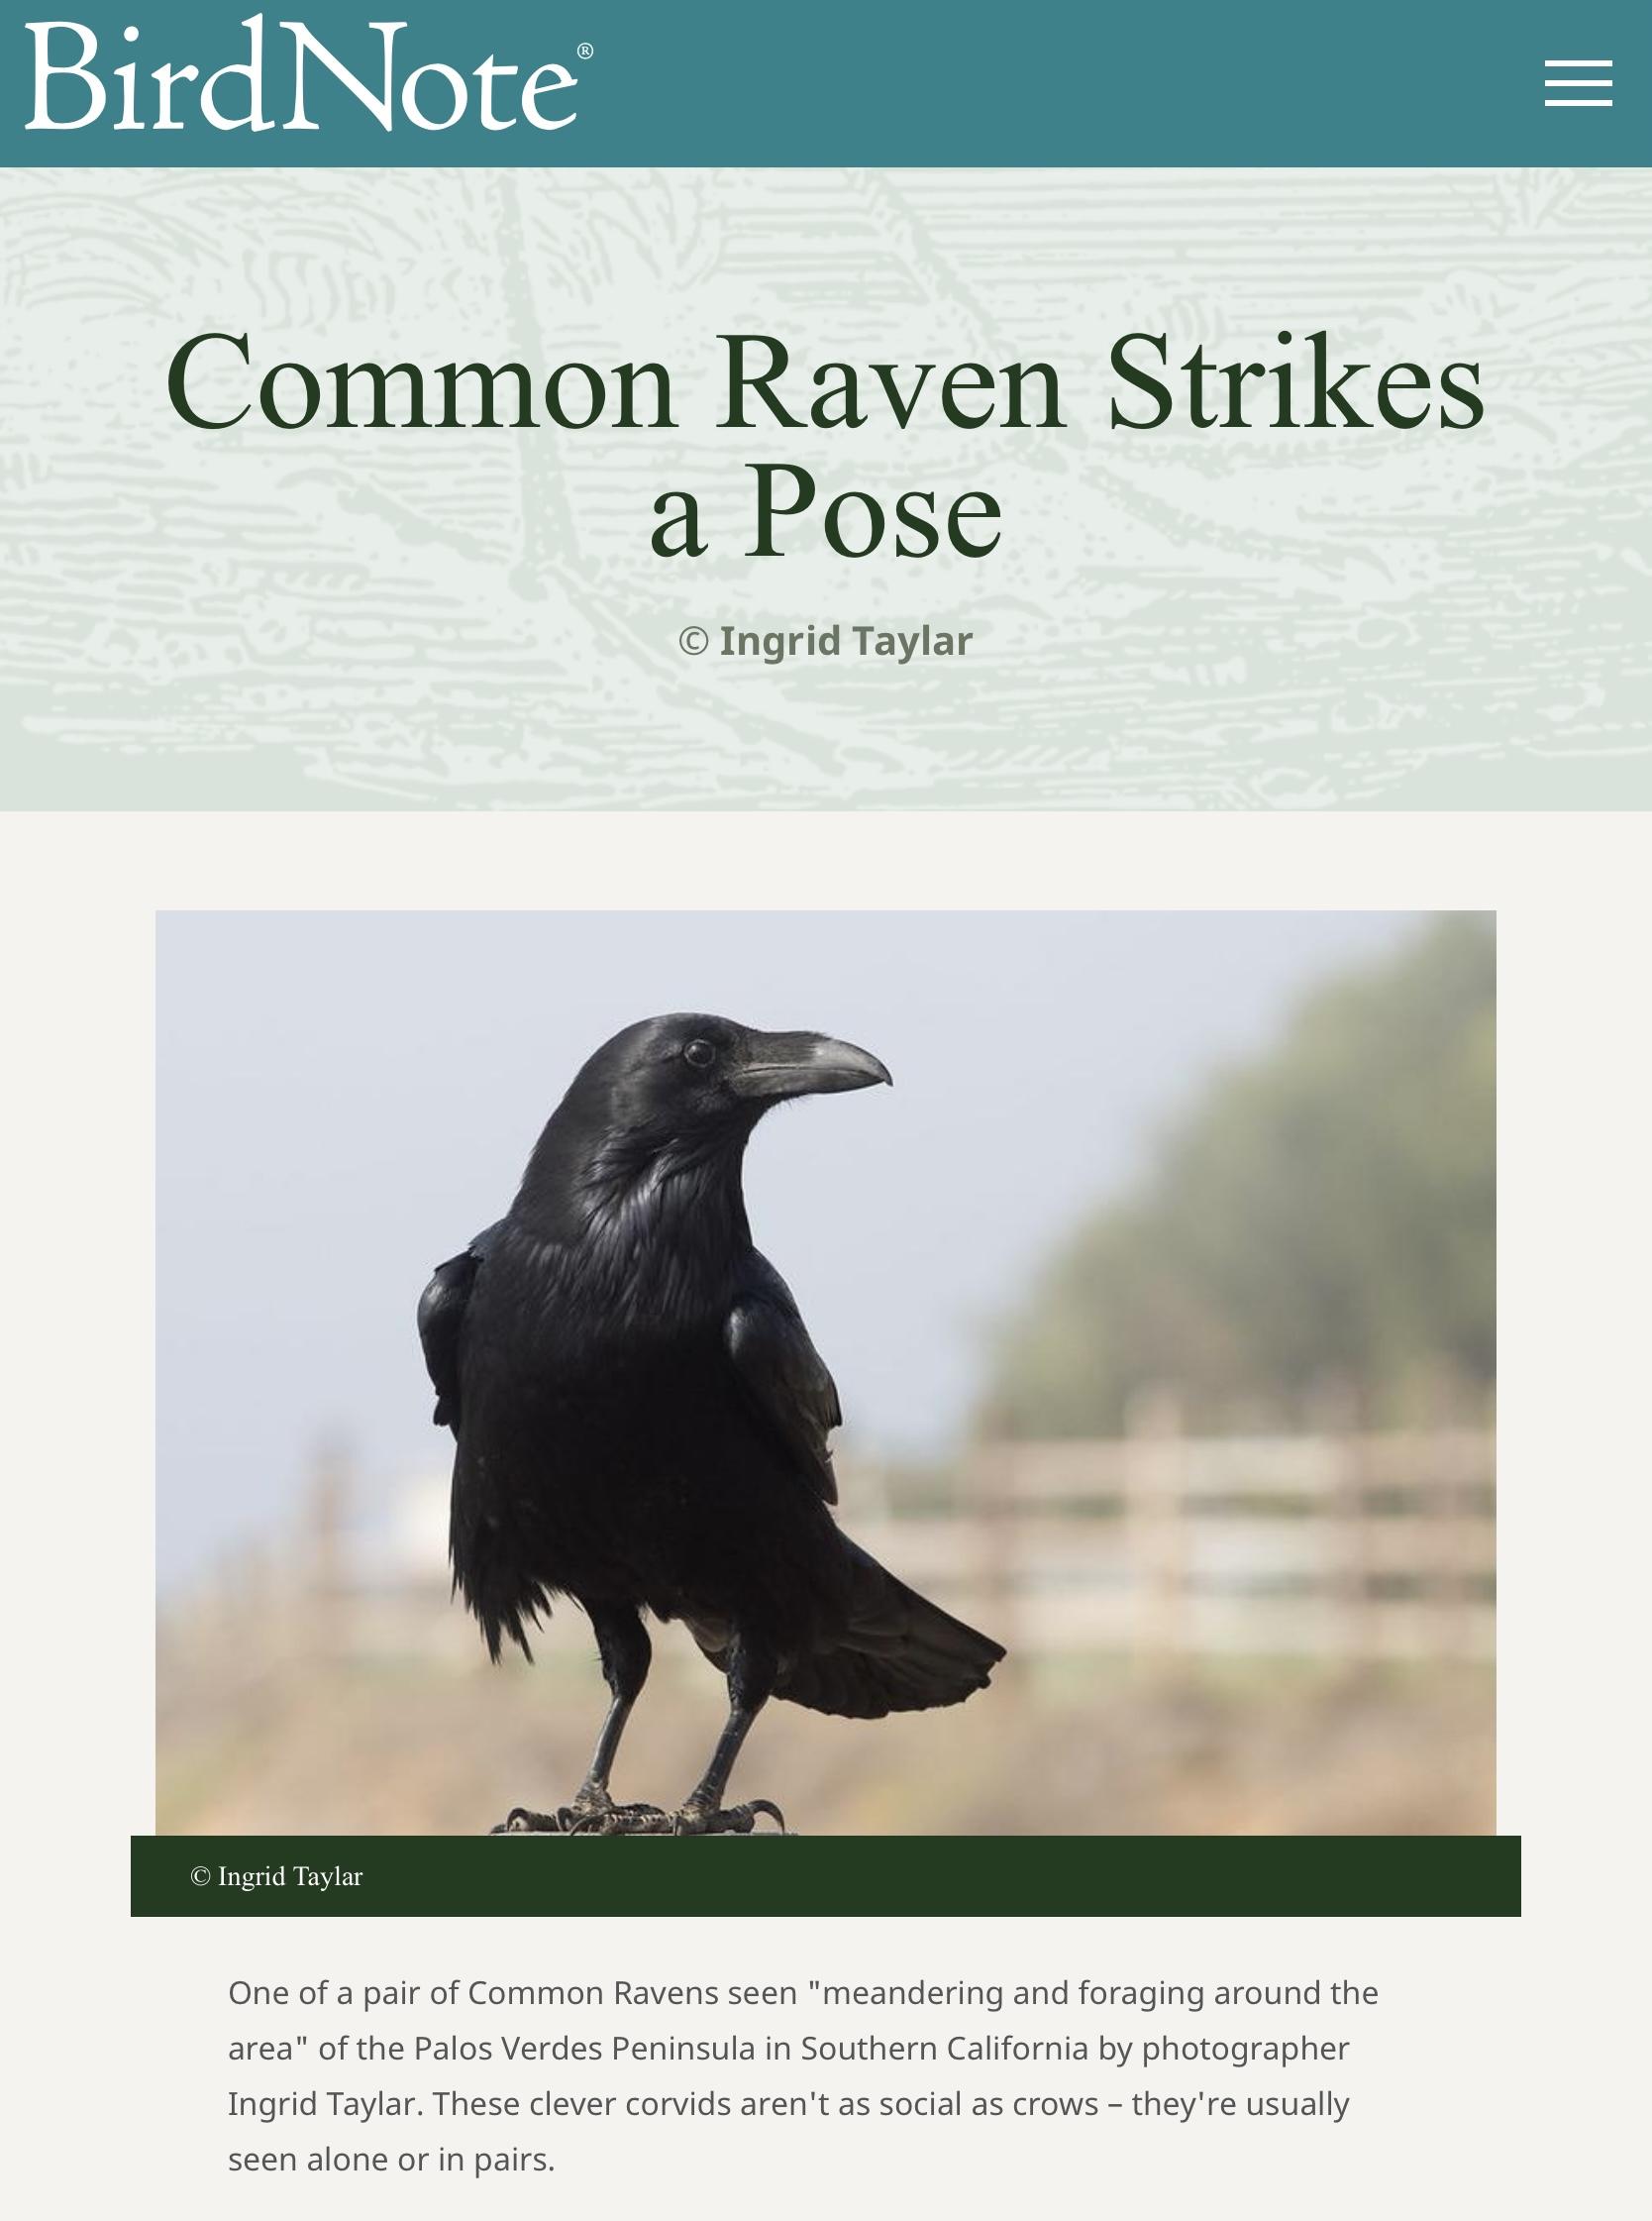 Raven Image at BirdNote